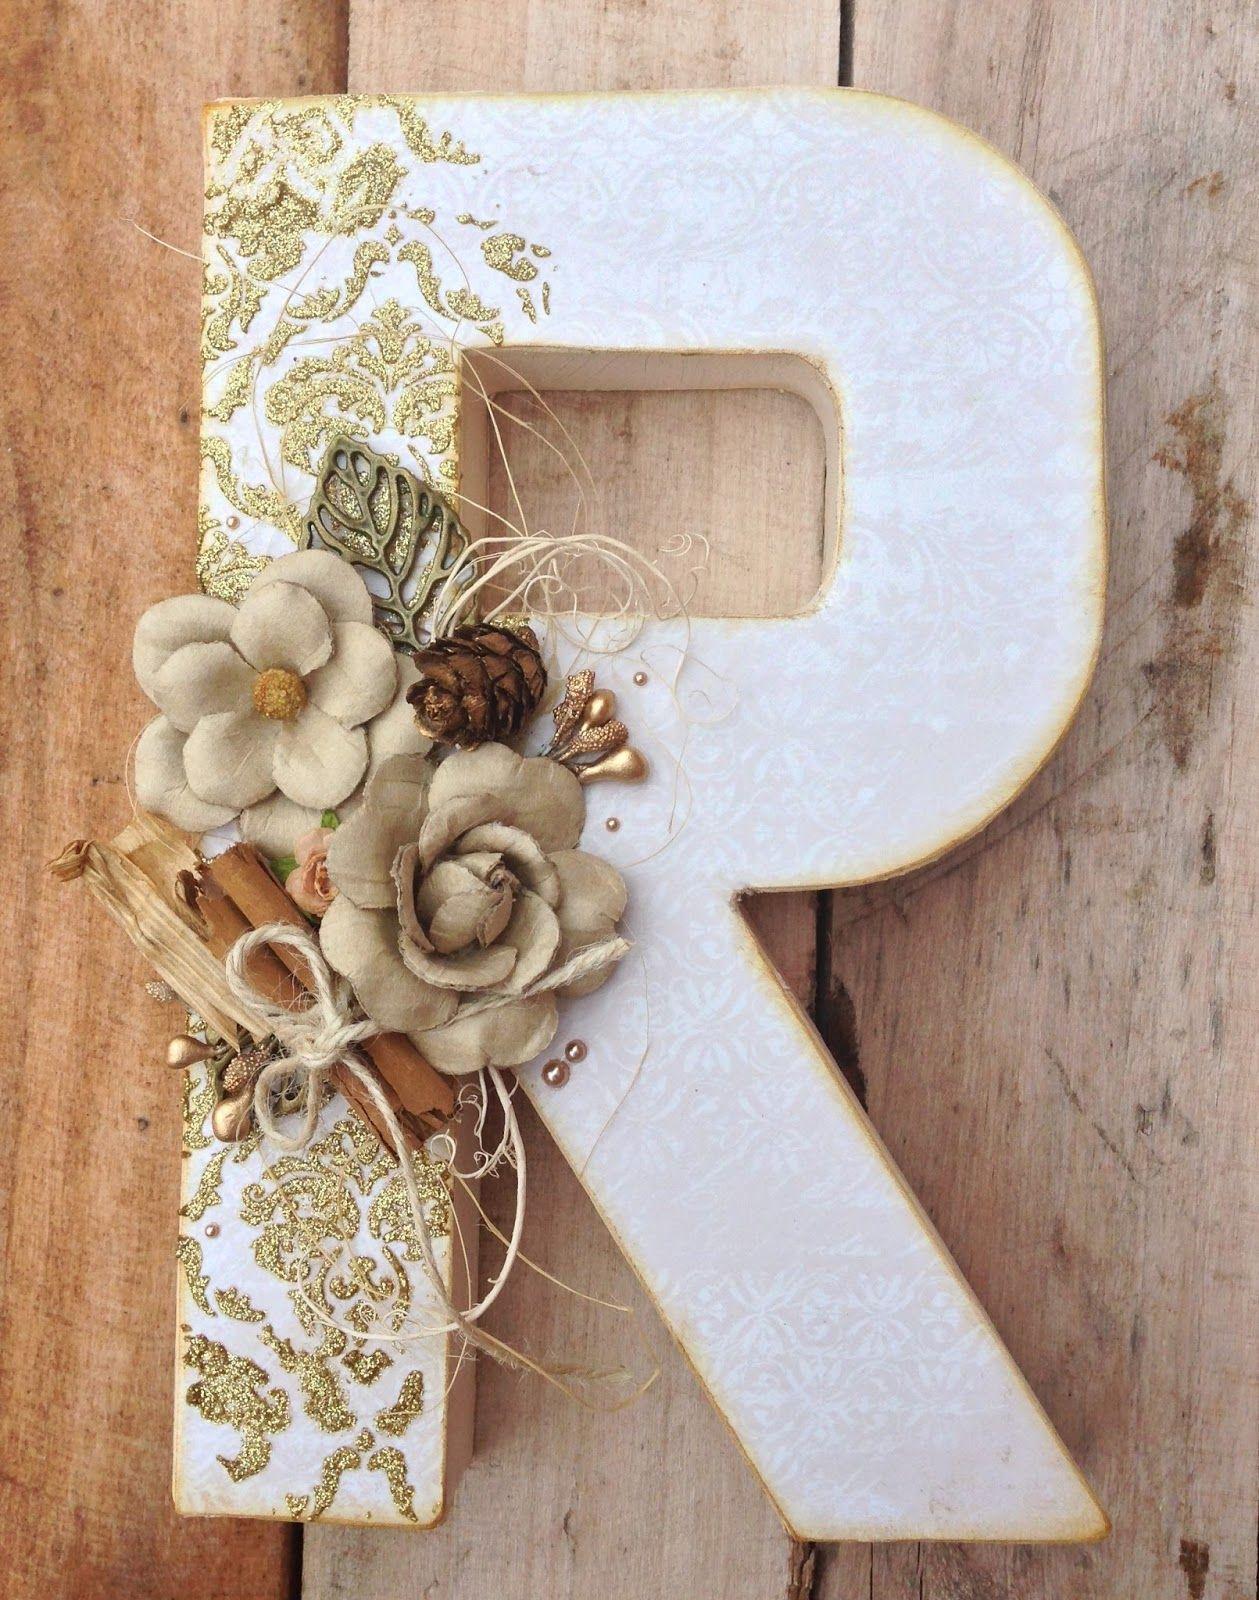 2015 10 letra letras decoradas pinterest letras - Letras de corcho decoradas ...